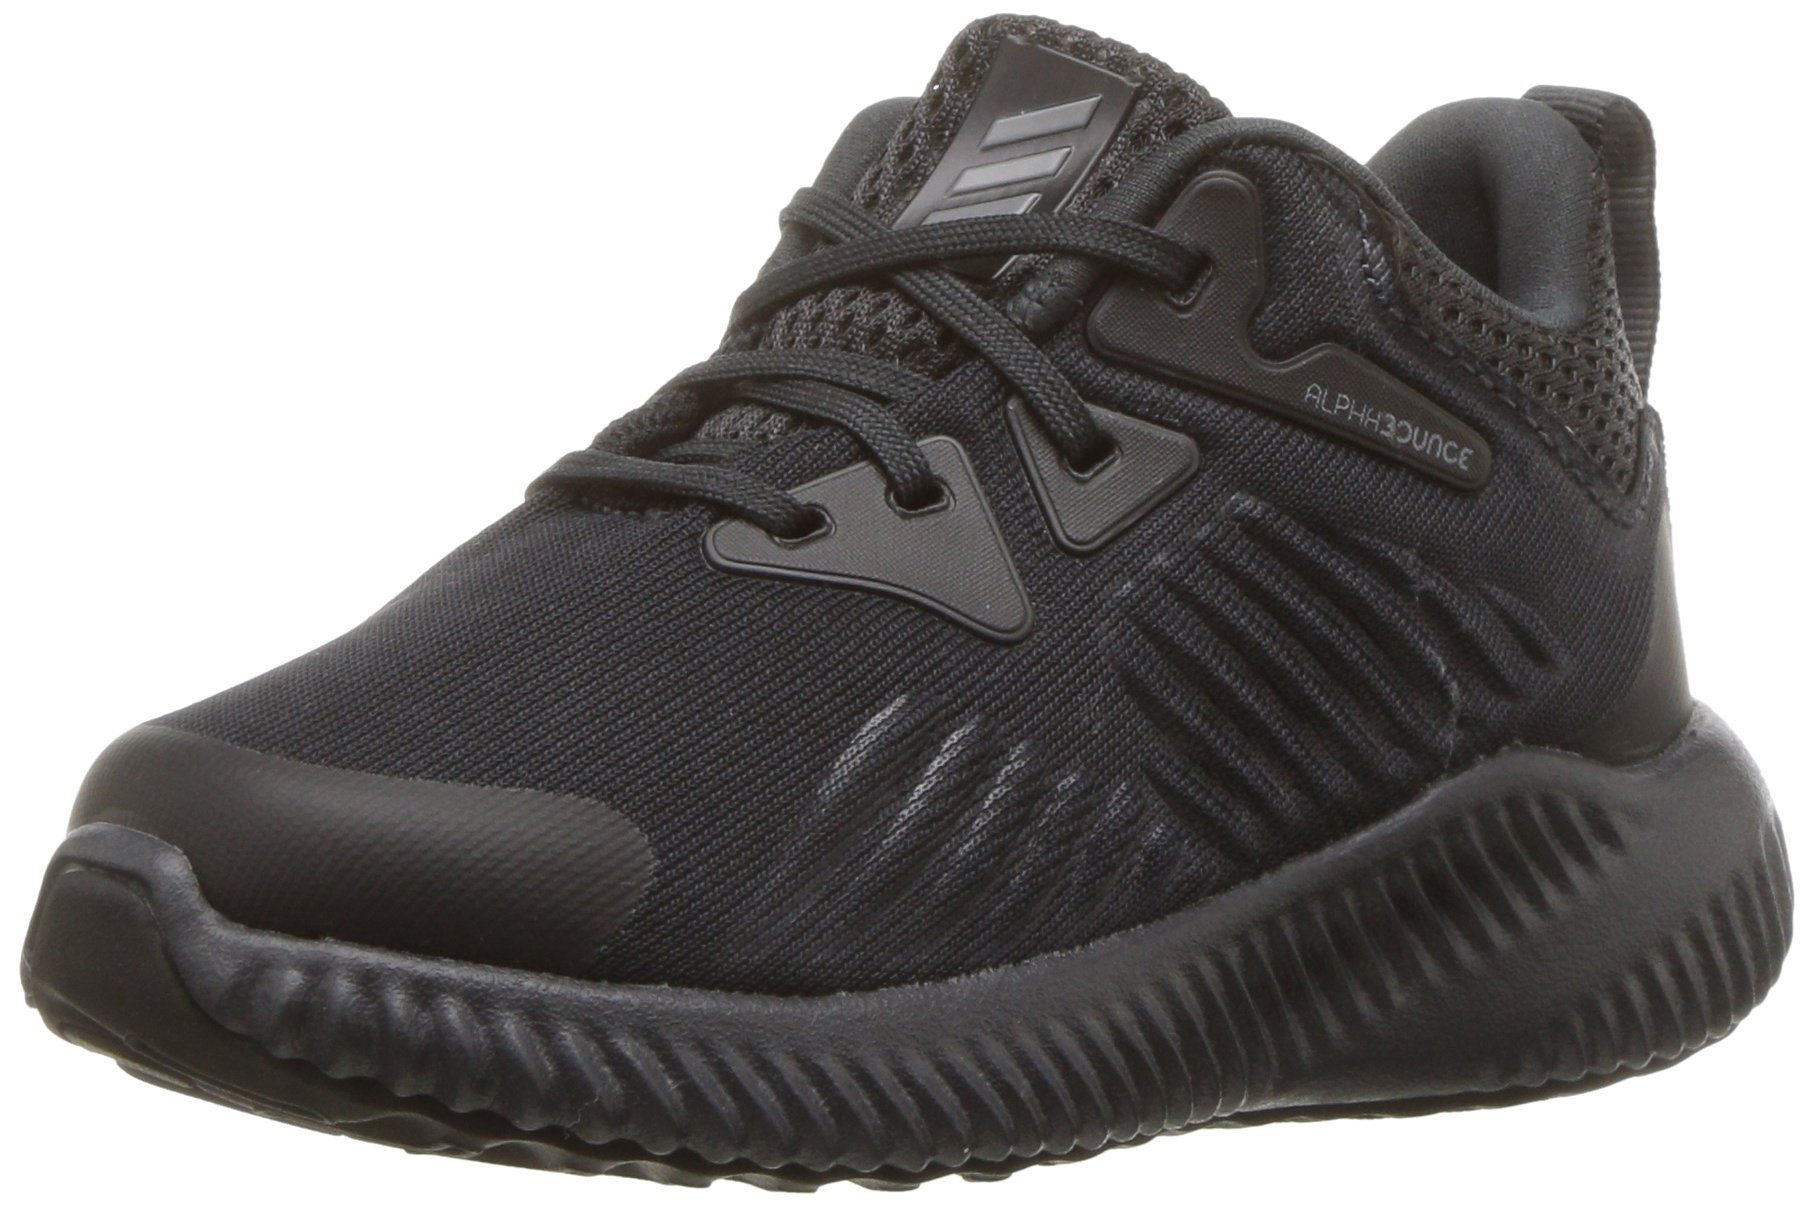 adidas Unisex Alphabounce Beyond Running Shoe, Carbon/Grey/Black, 6 M US Big Kid